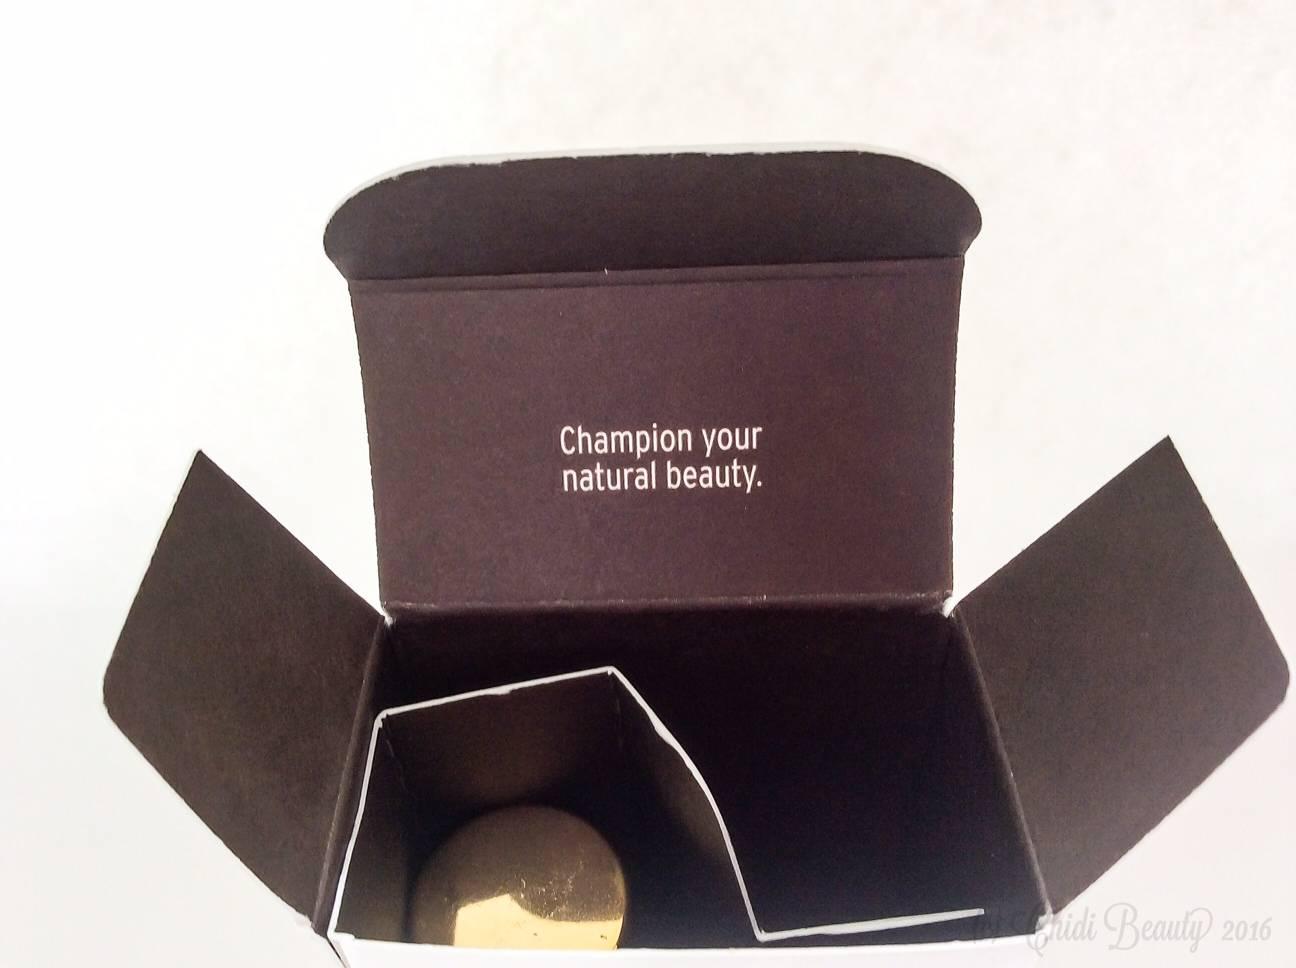 Juara Candlenut Perfume Oil Box Quote • chidibeauty.com